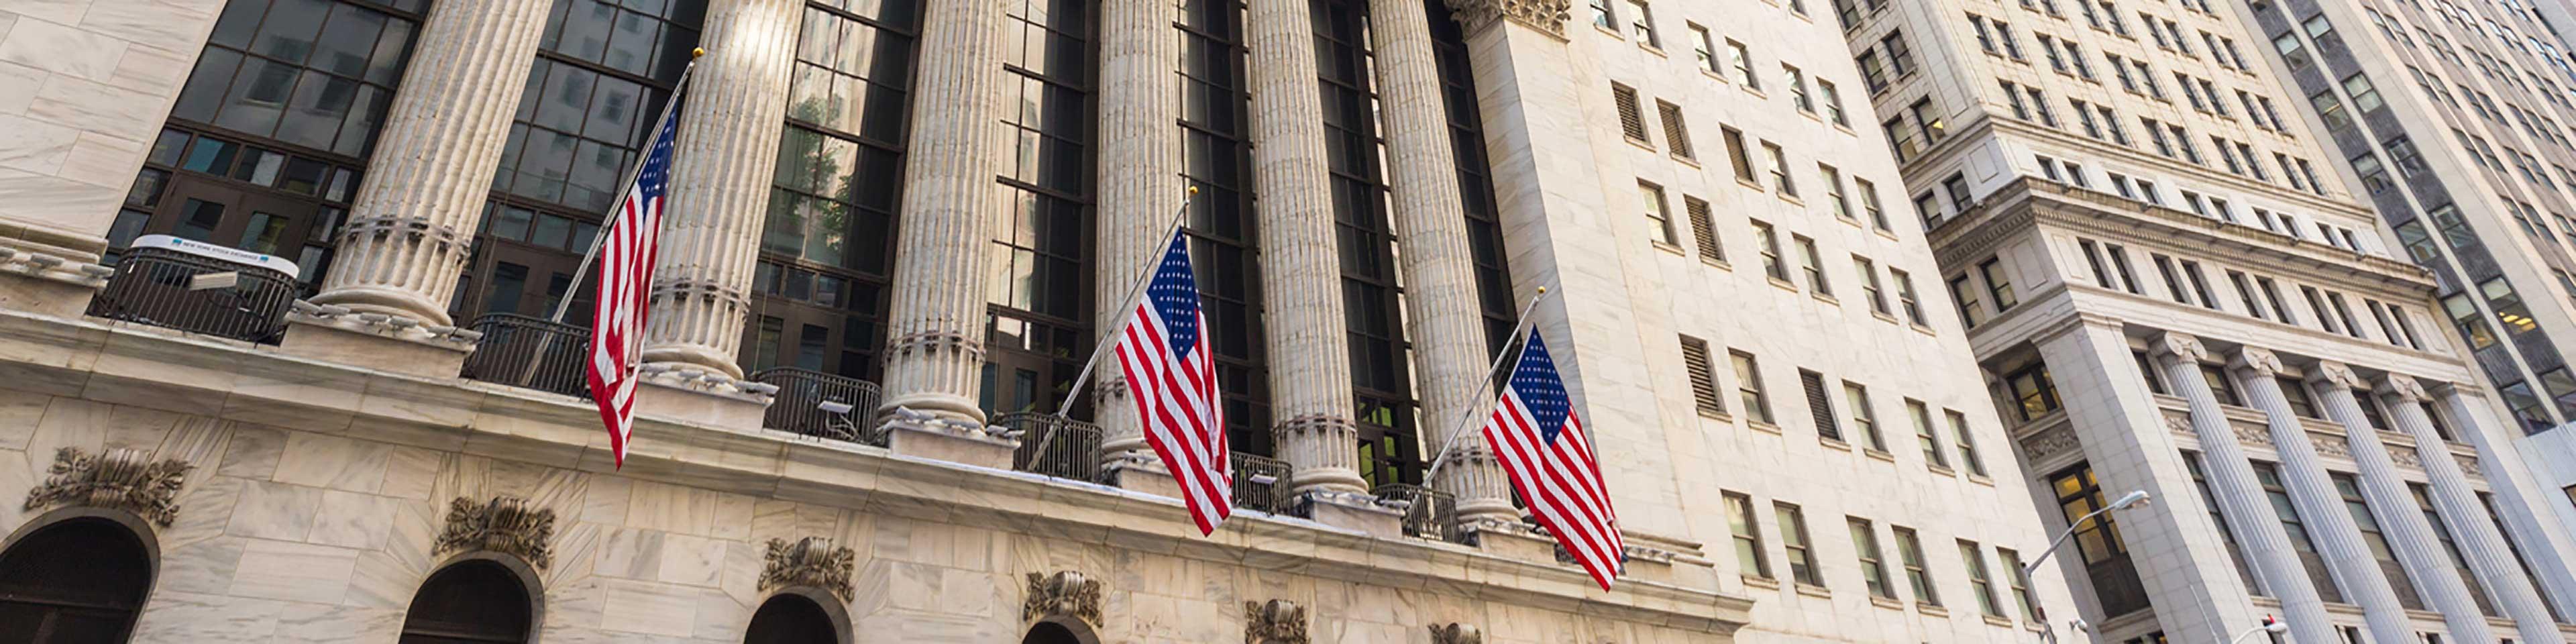 Limiting Banks' Financial Risk: Managing Non-Wage Garnishments & Levies